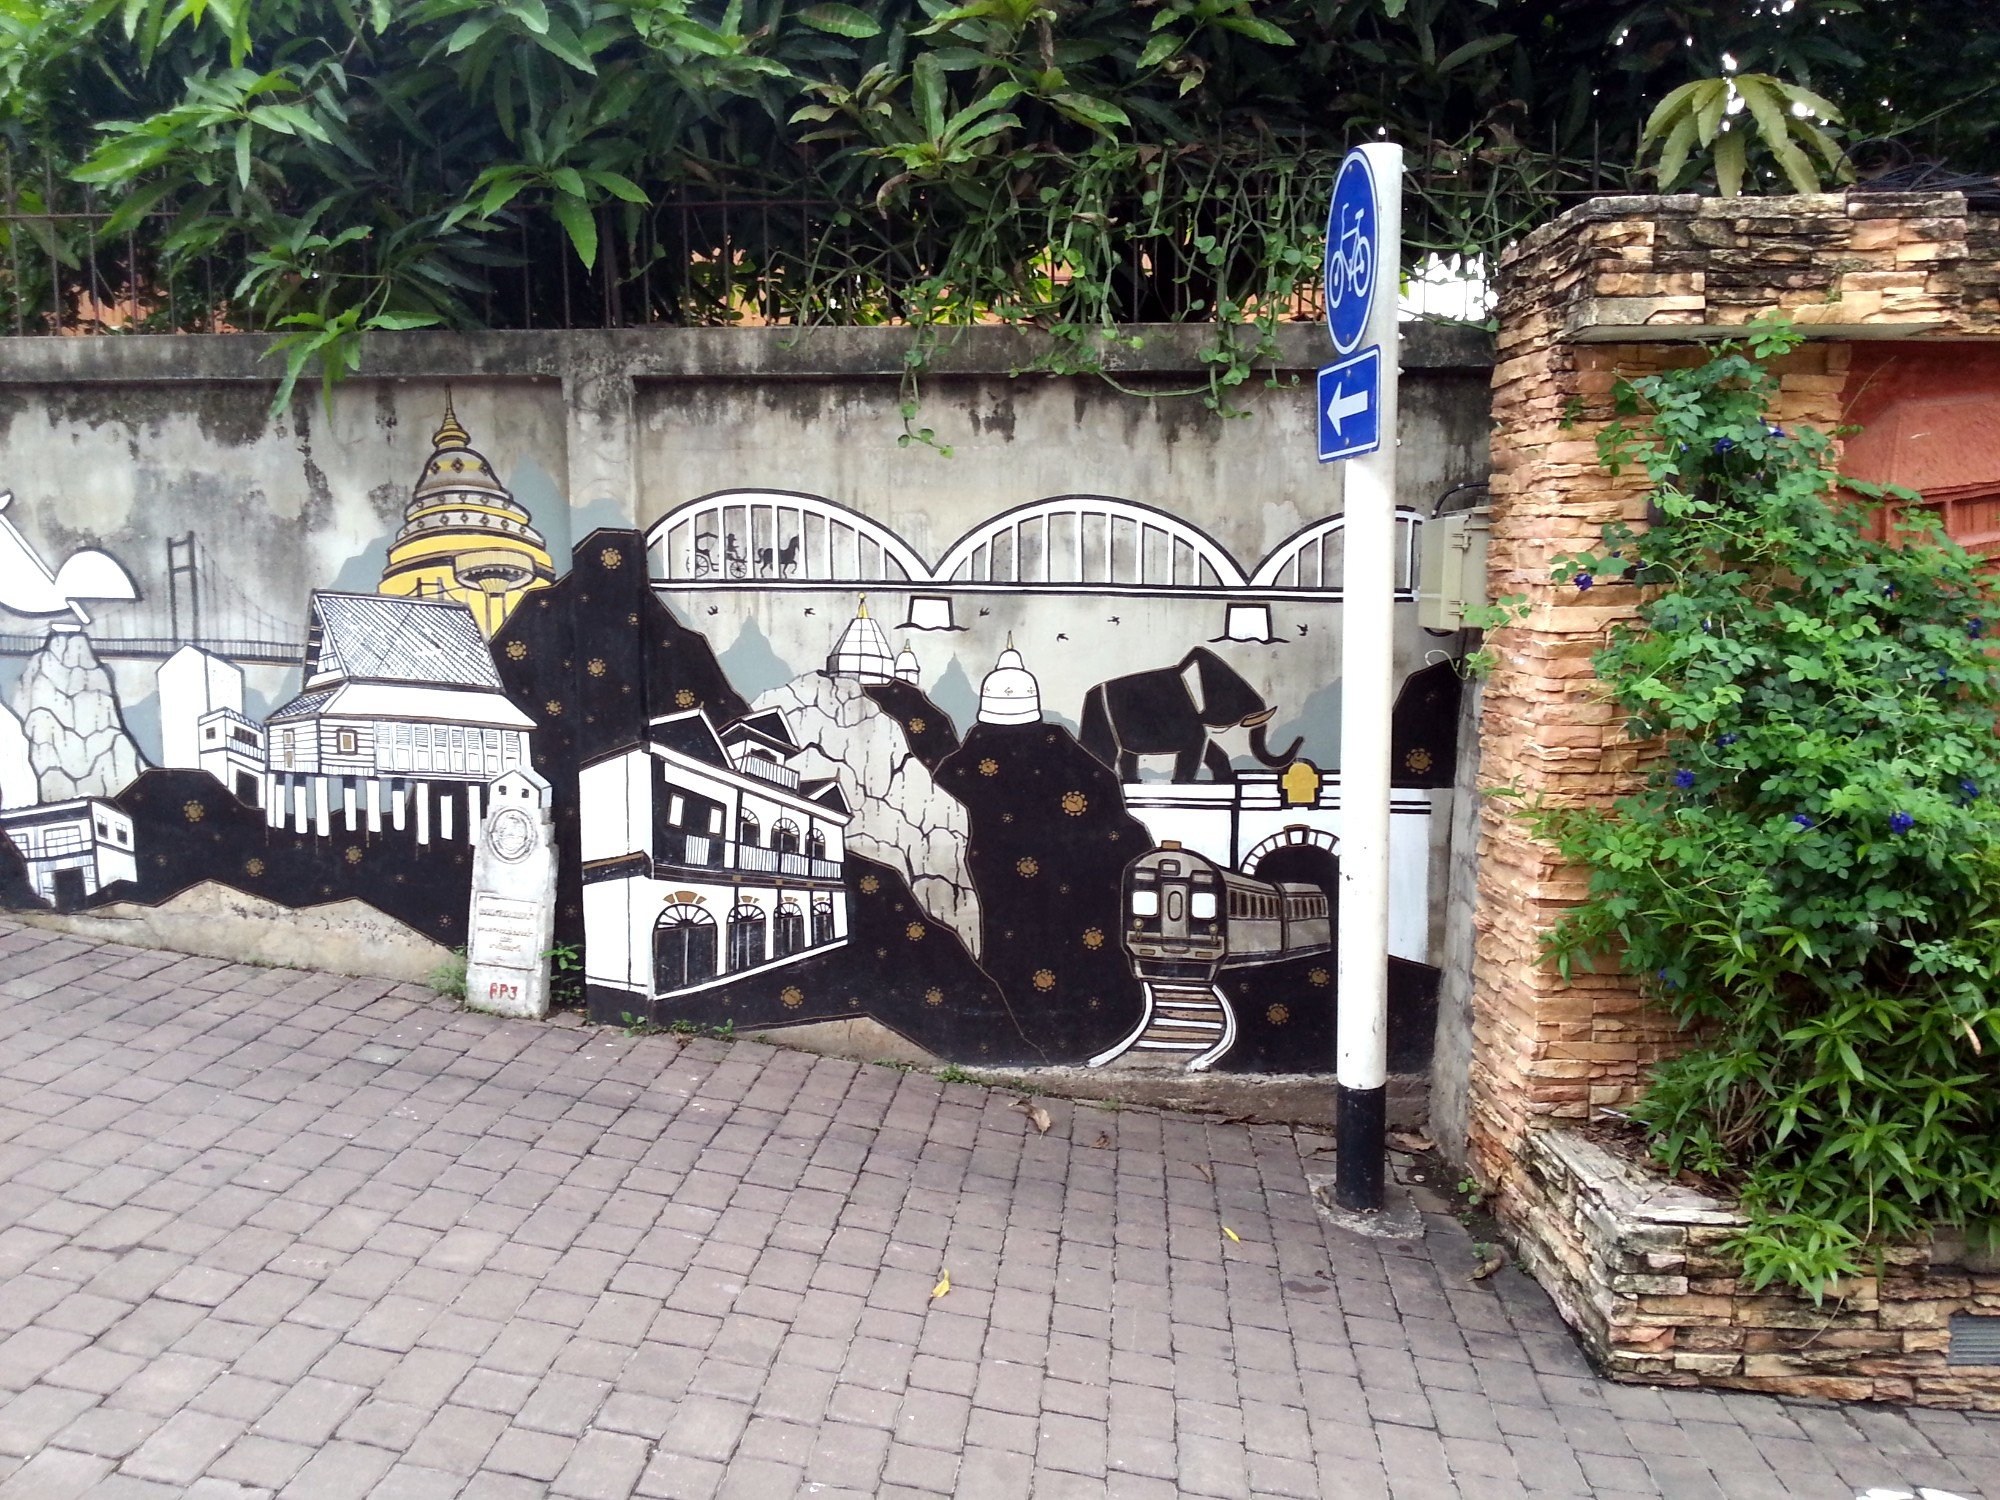 Attractions of Lampang mural